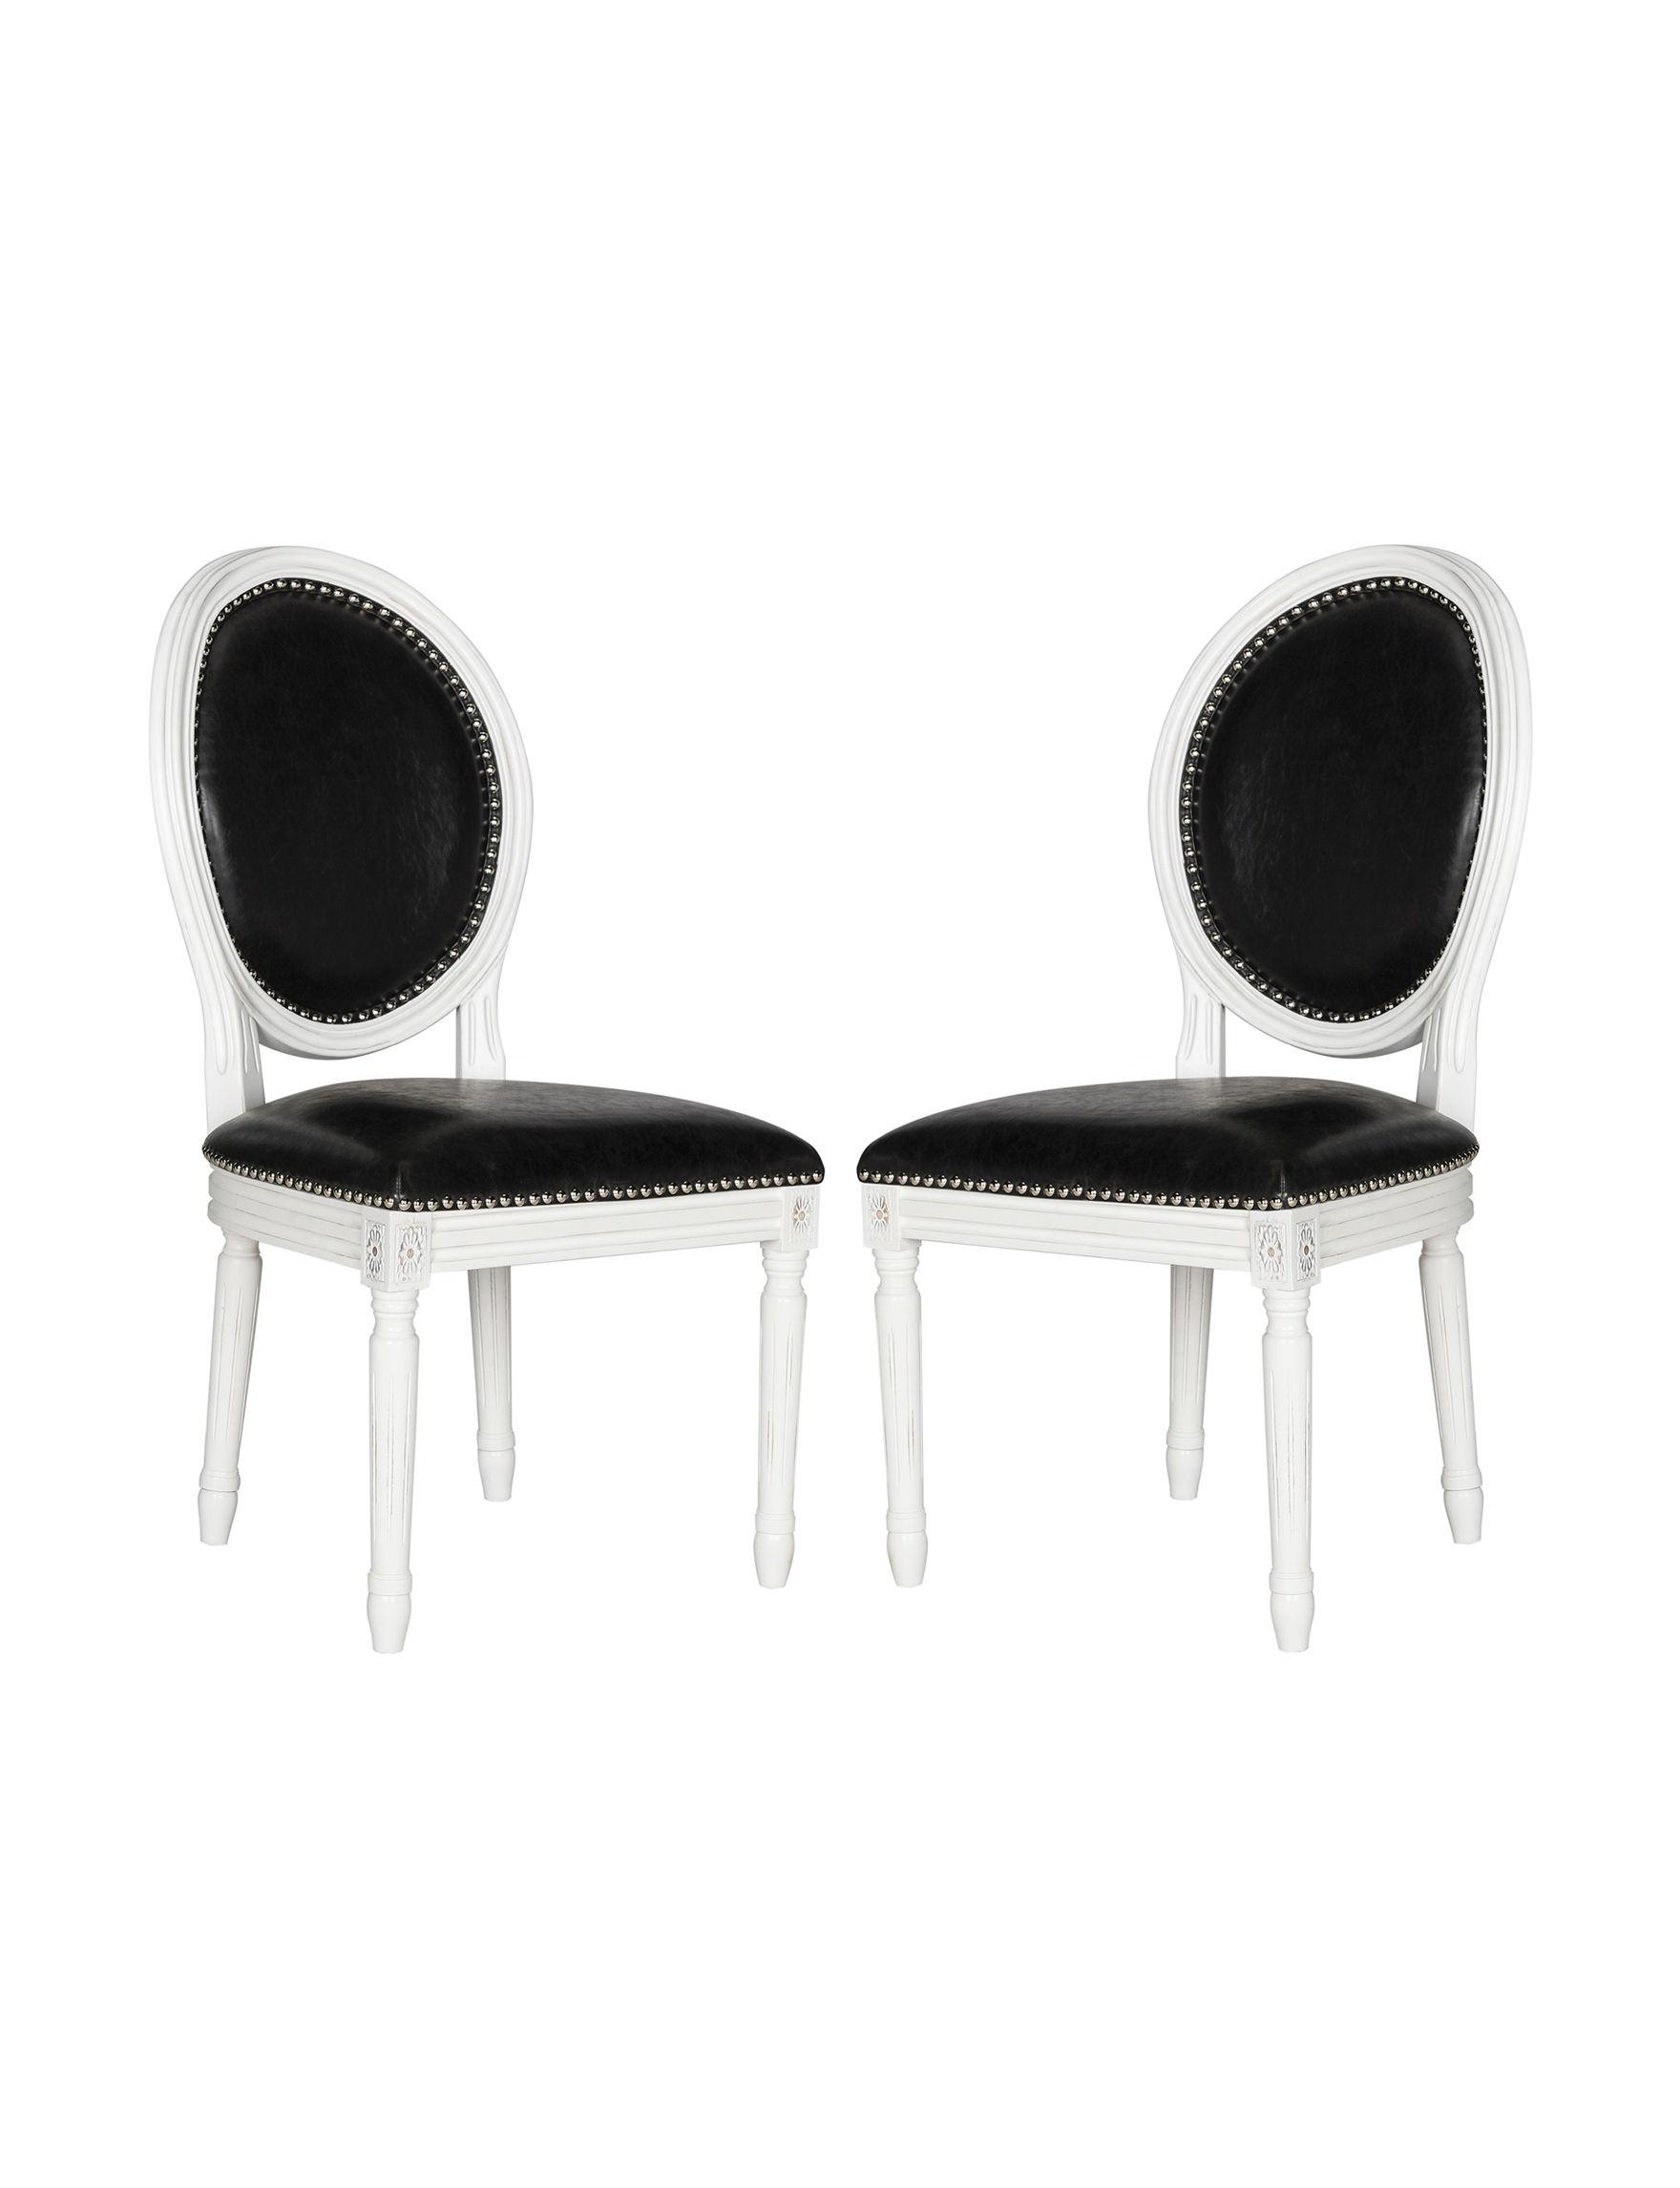 Safavieh Black Dining Chairs Kitchen & Dining Furniture